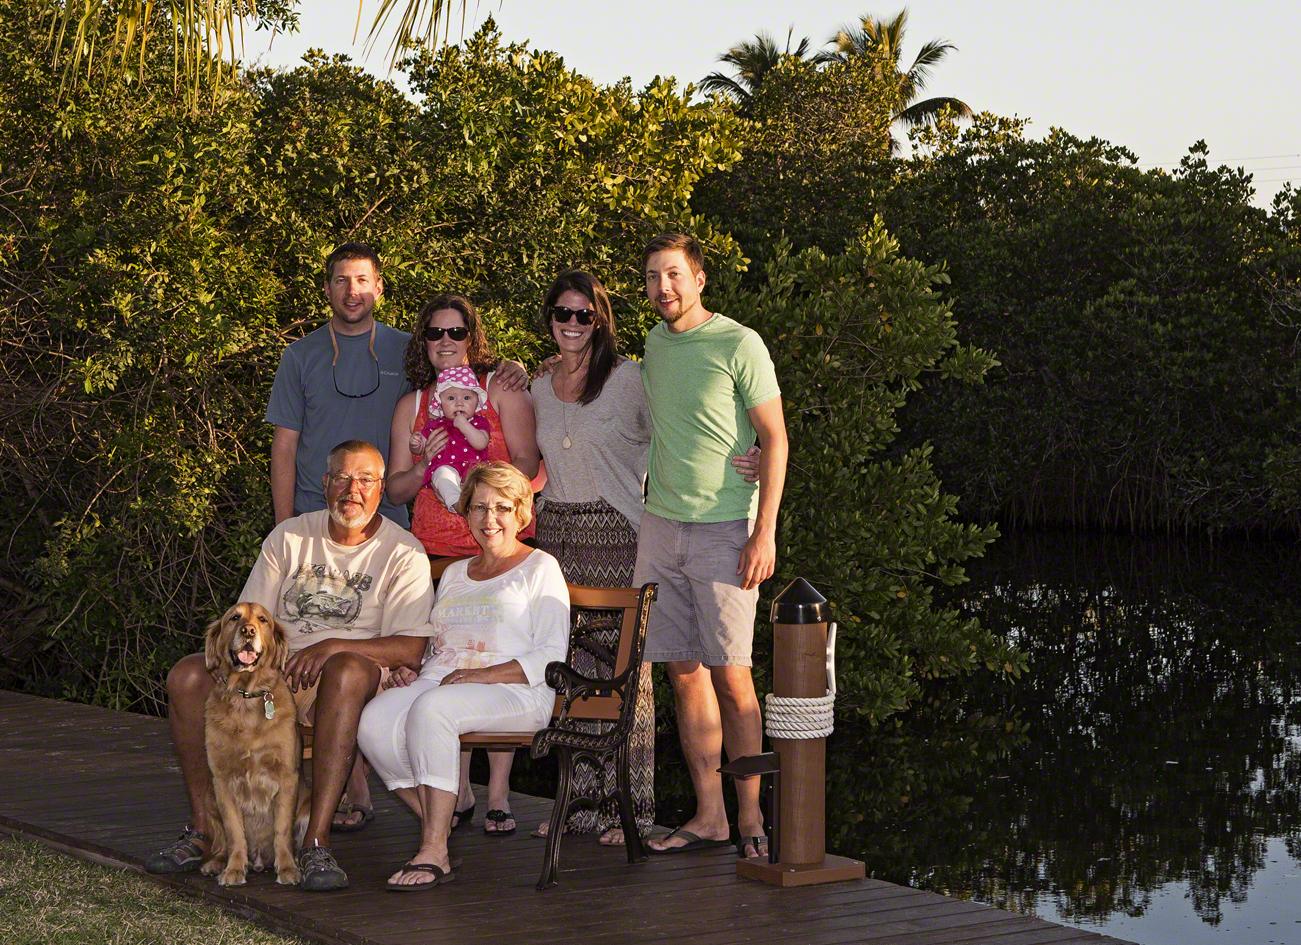 the gratuitous family photo